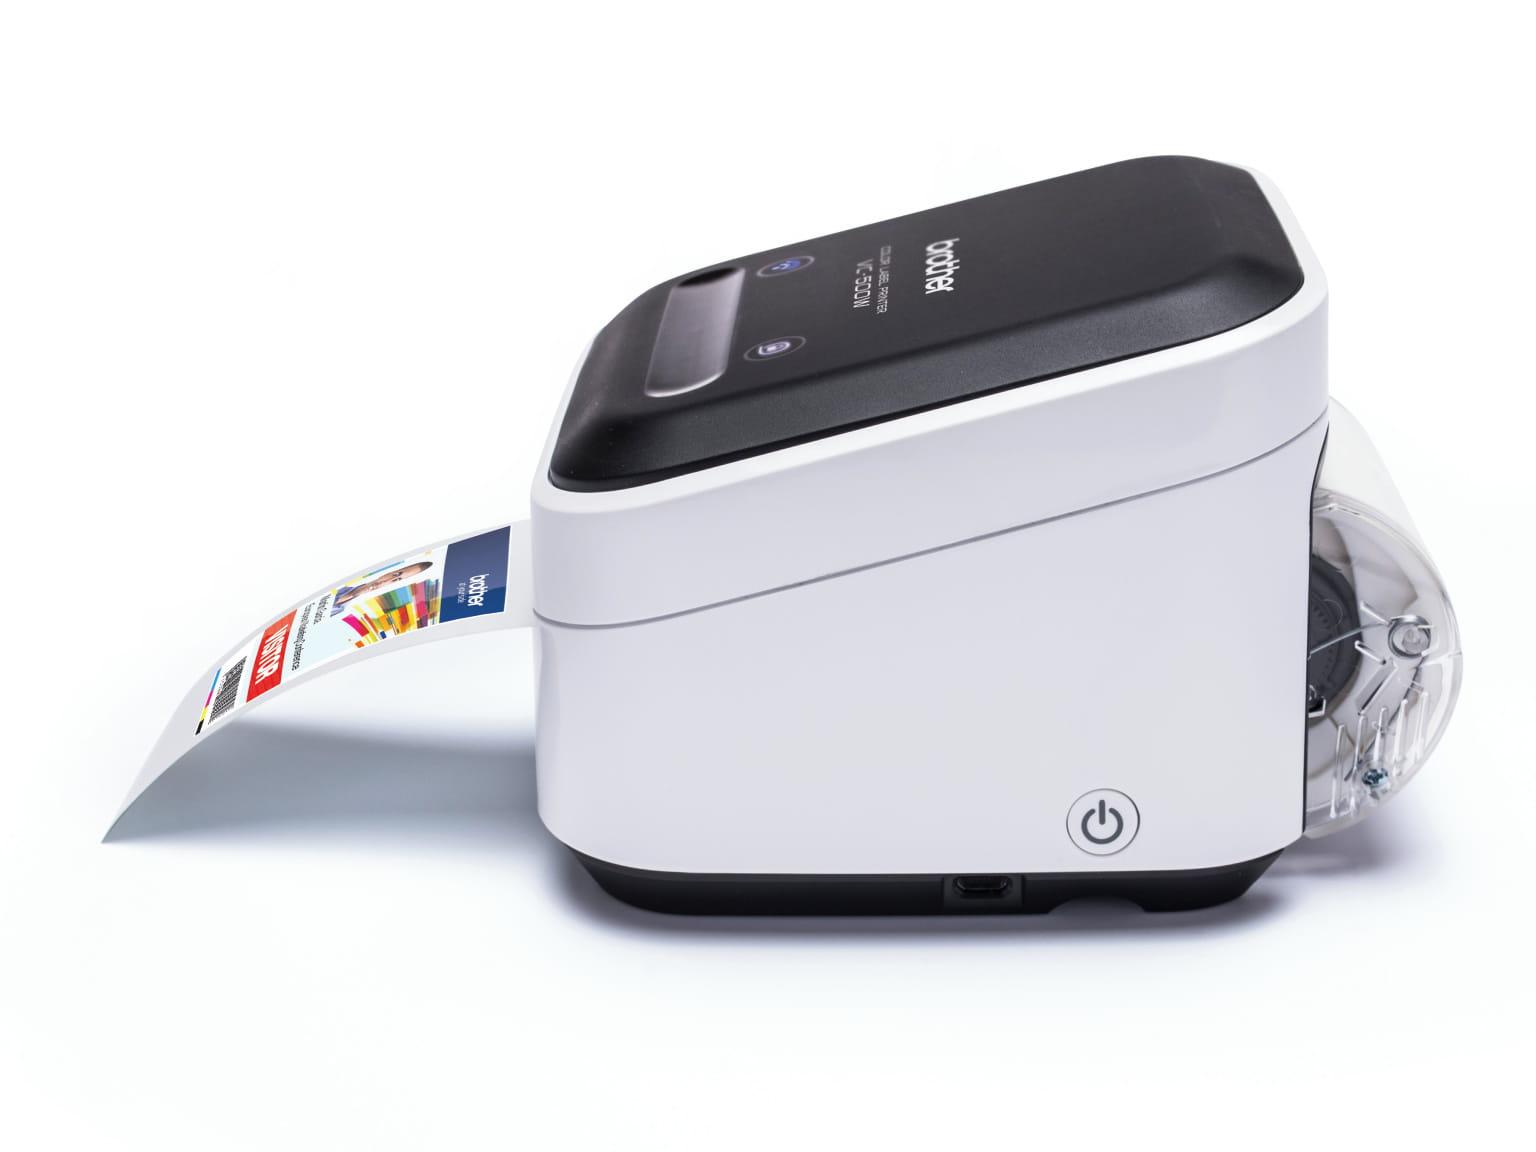 Imprimanta VC-500W fara cerneala imprima o eticheta foto